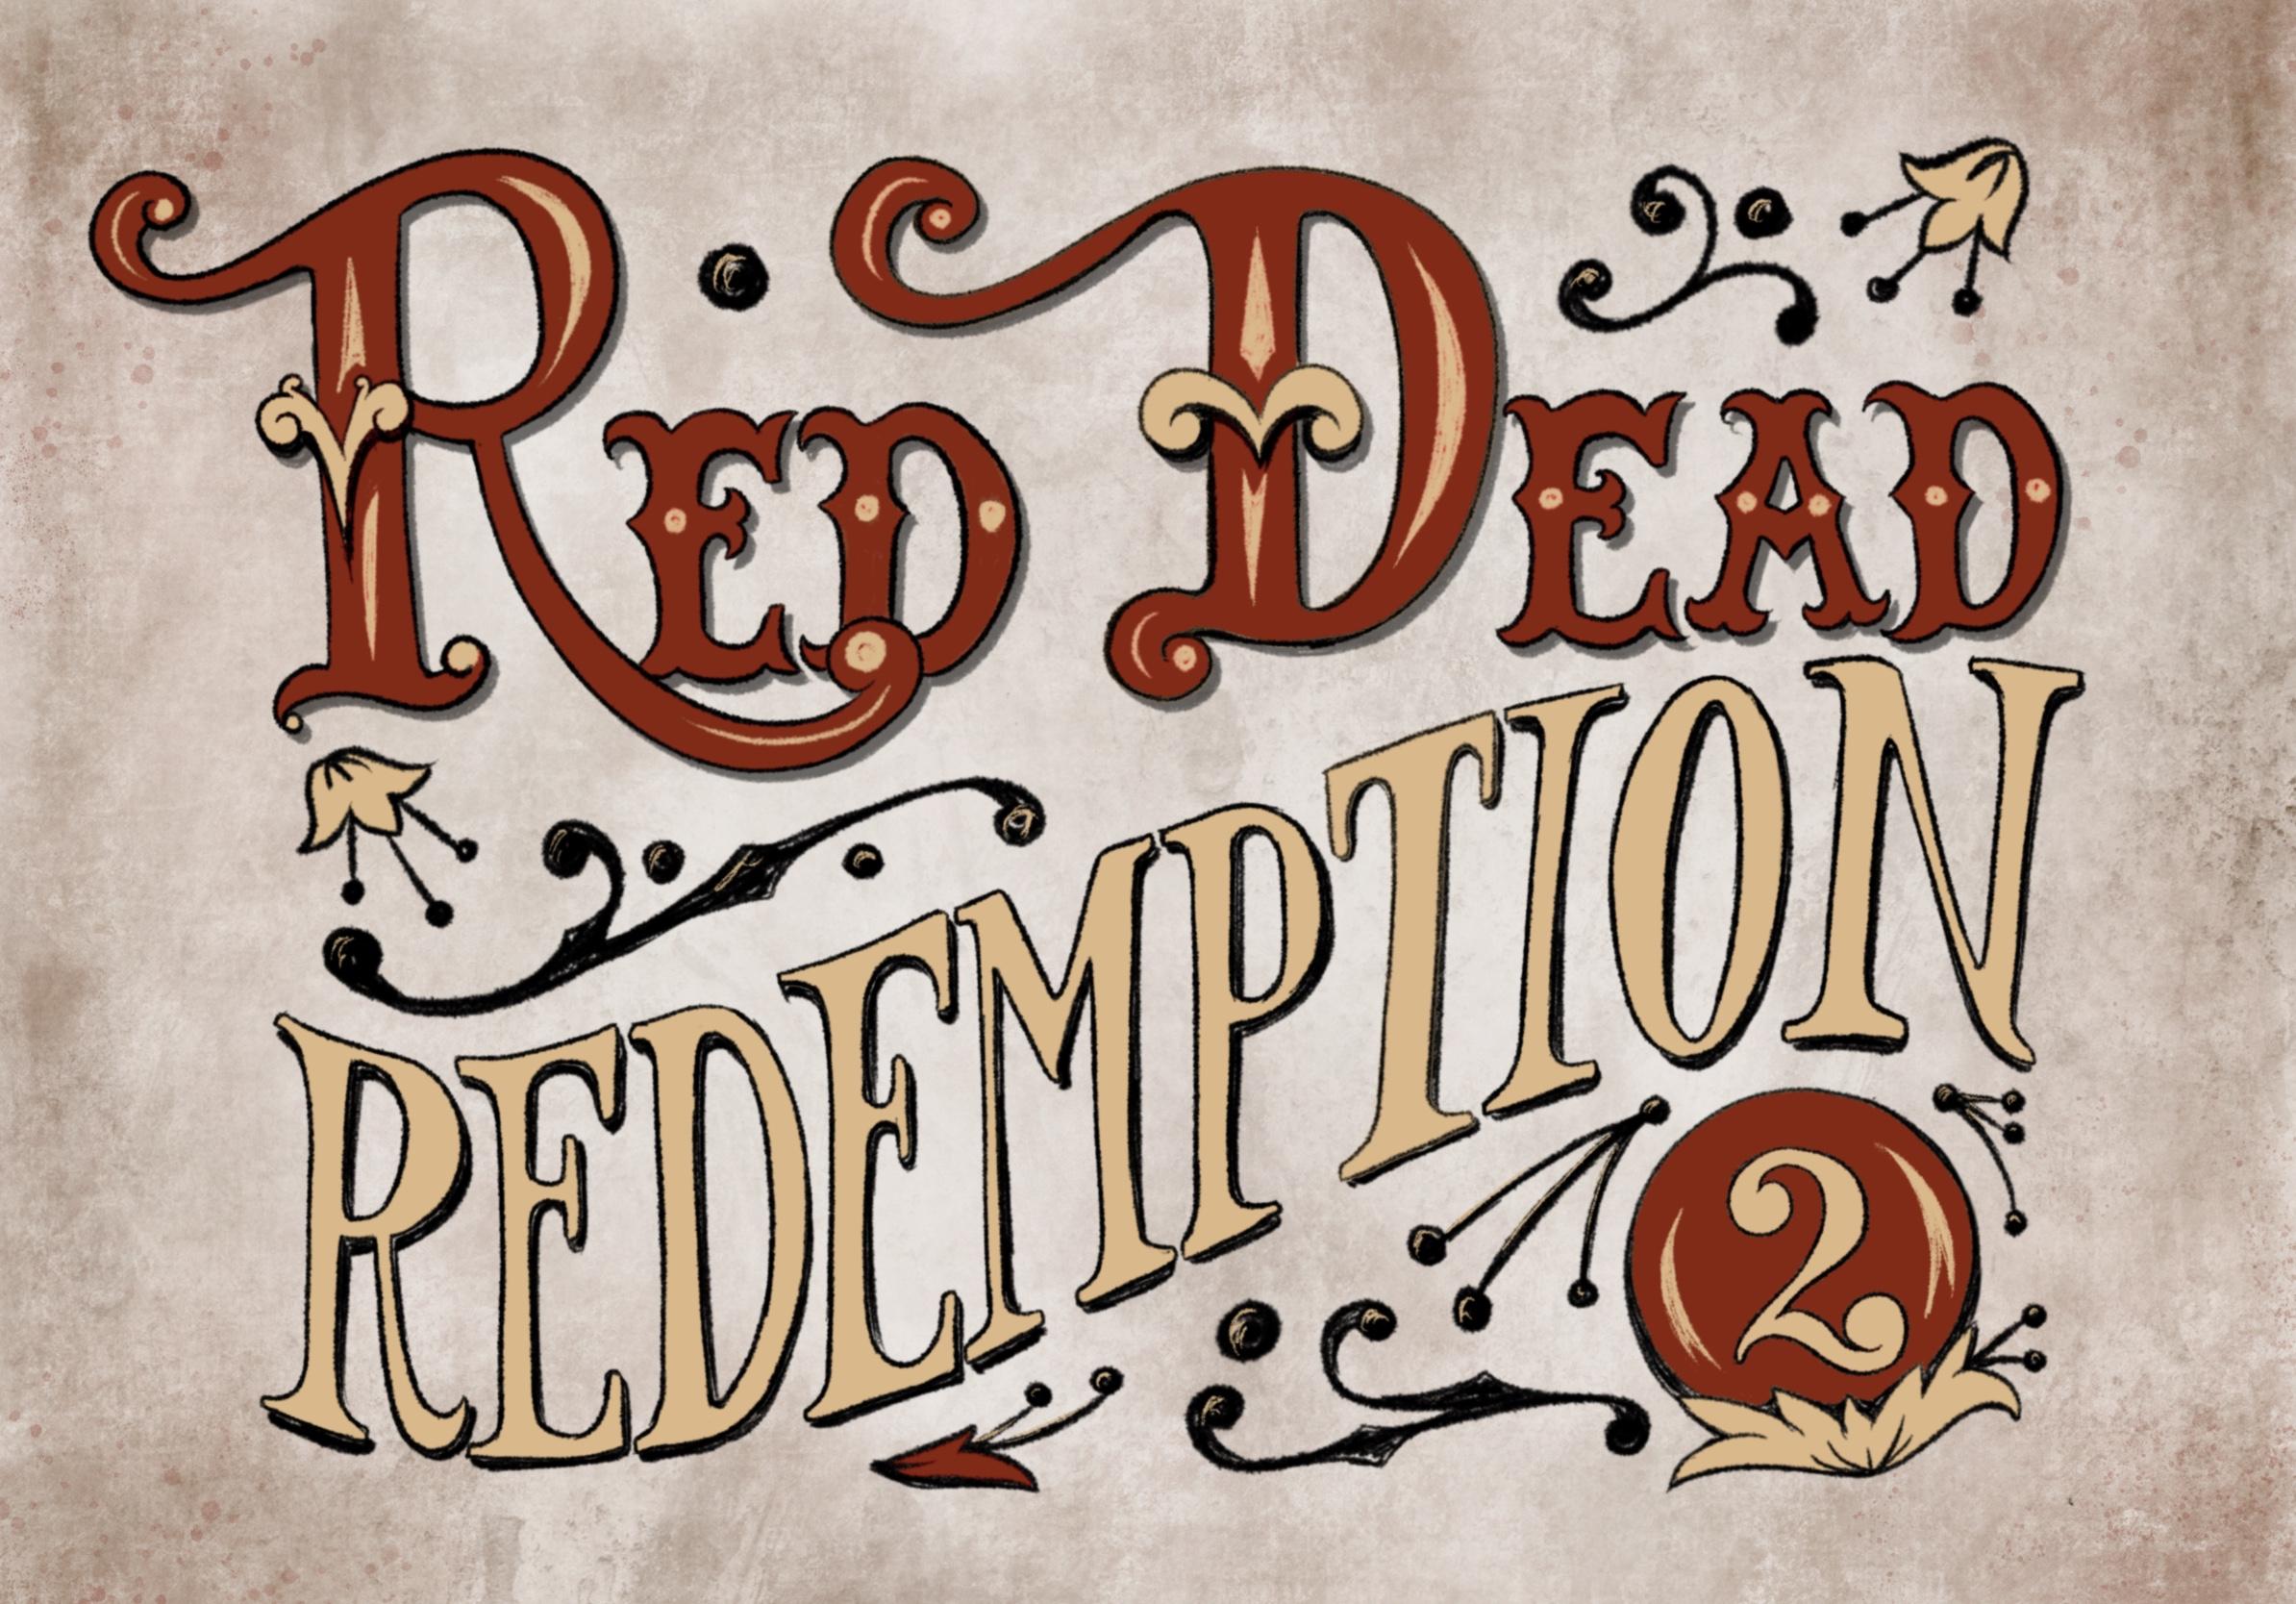 Red Dead Redemption 2 Handlettering